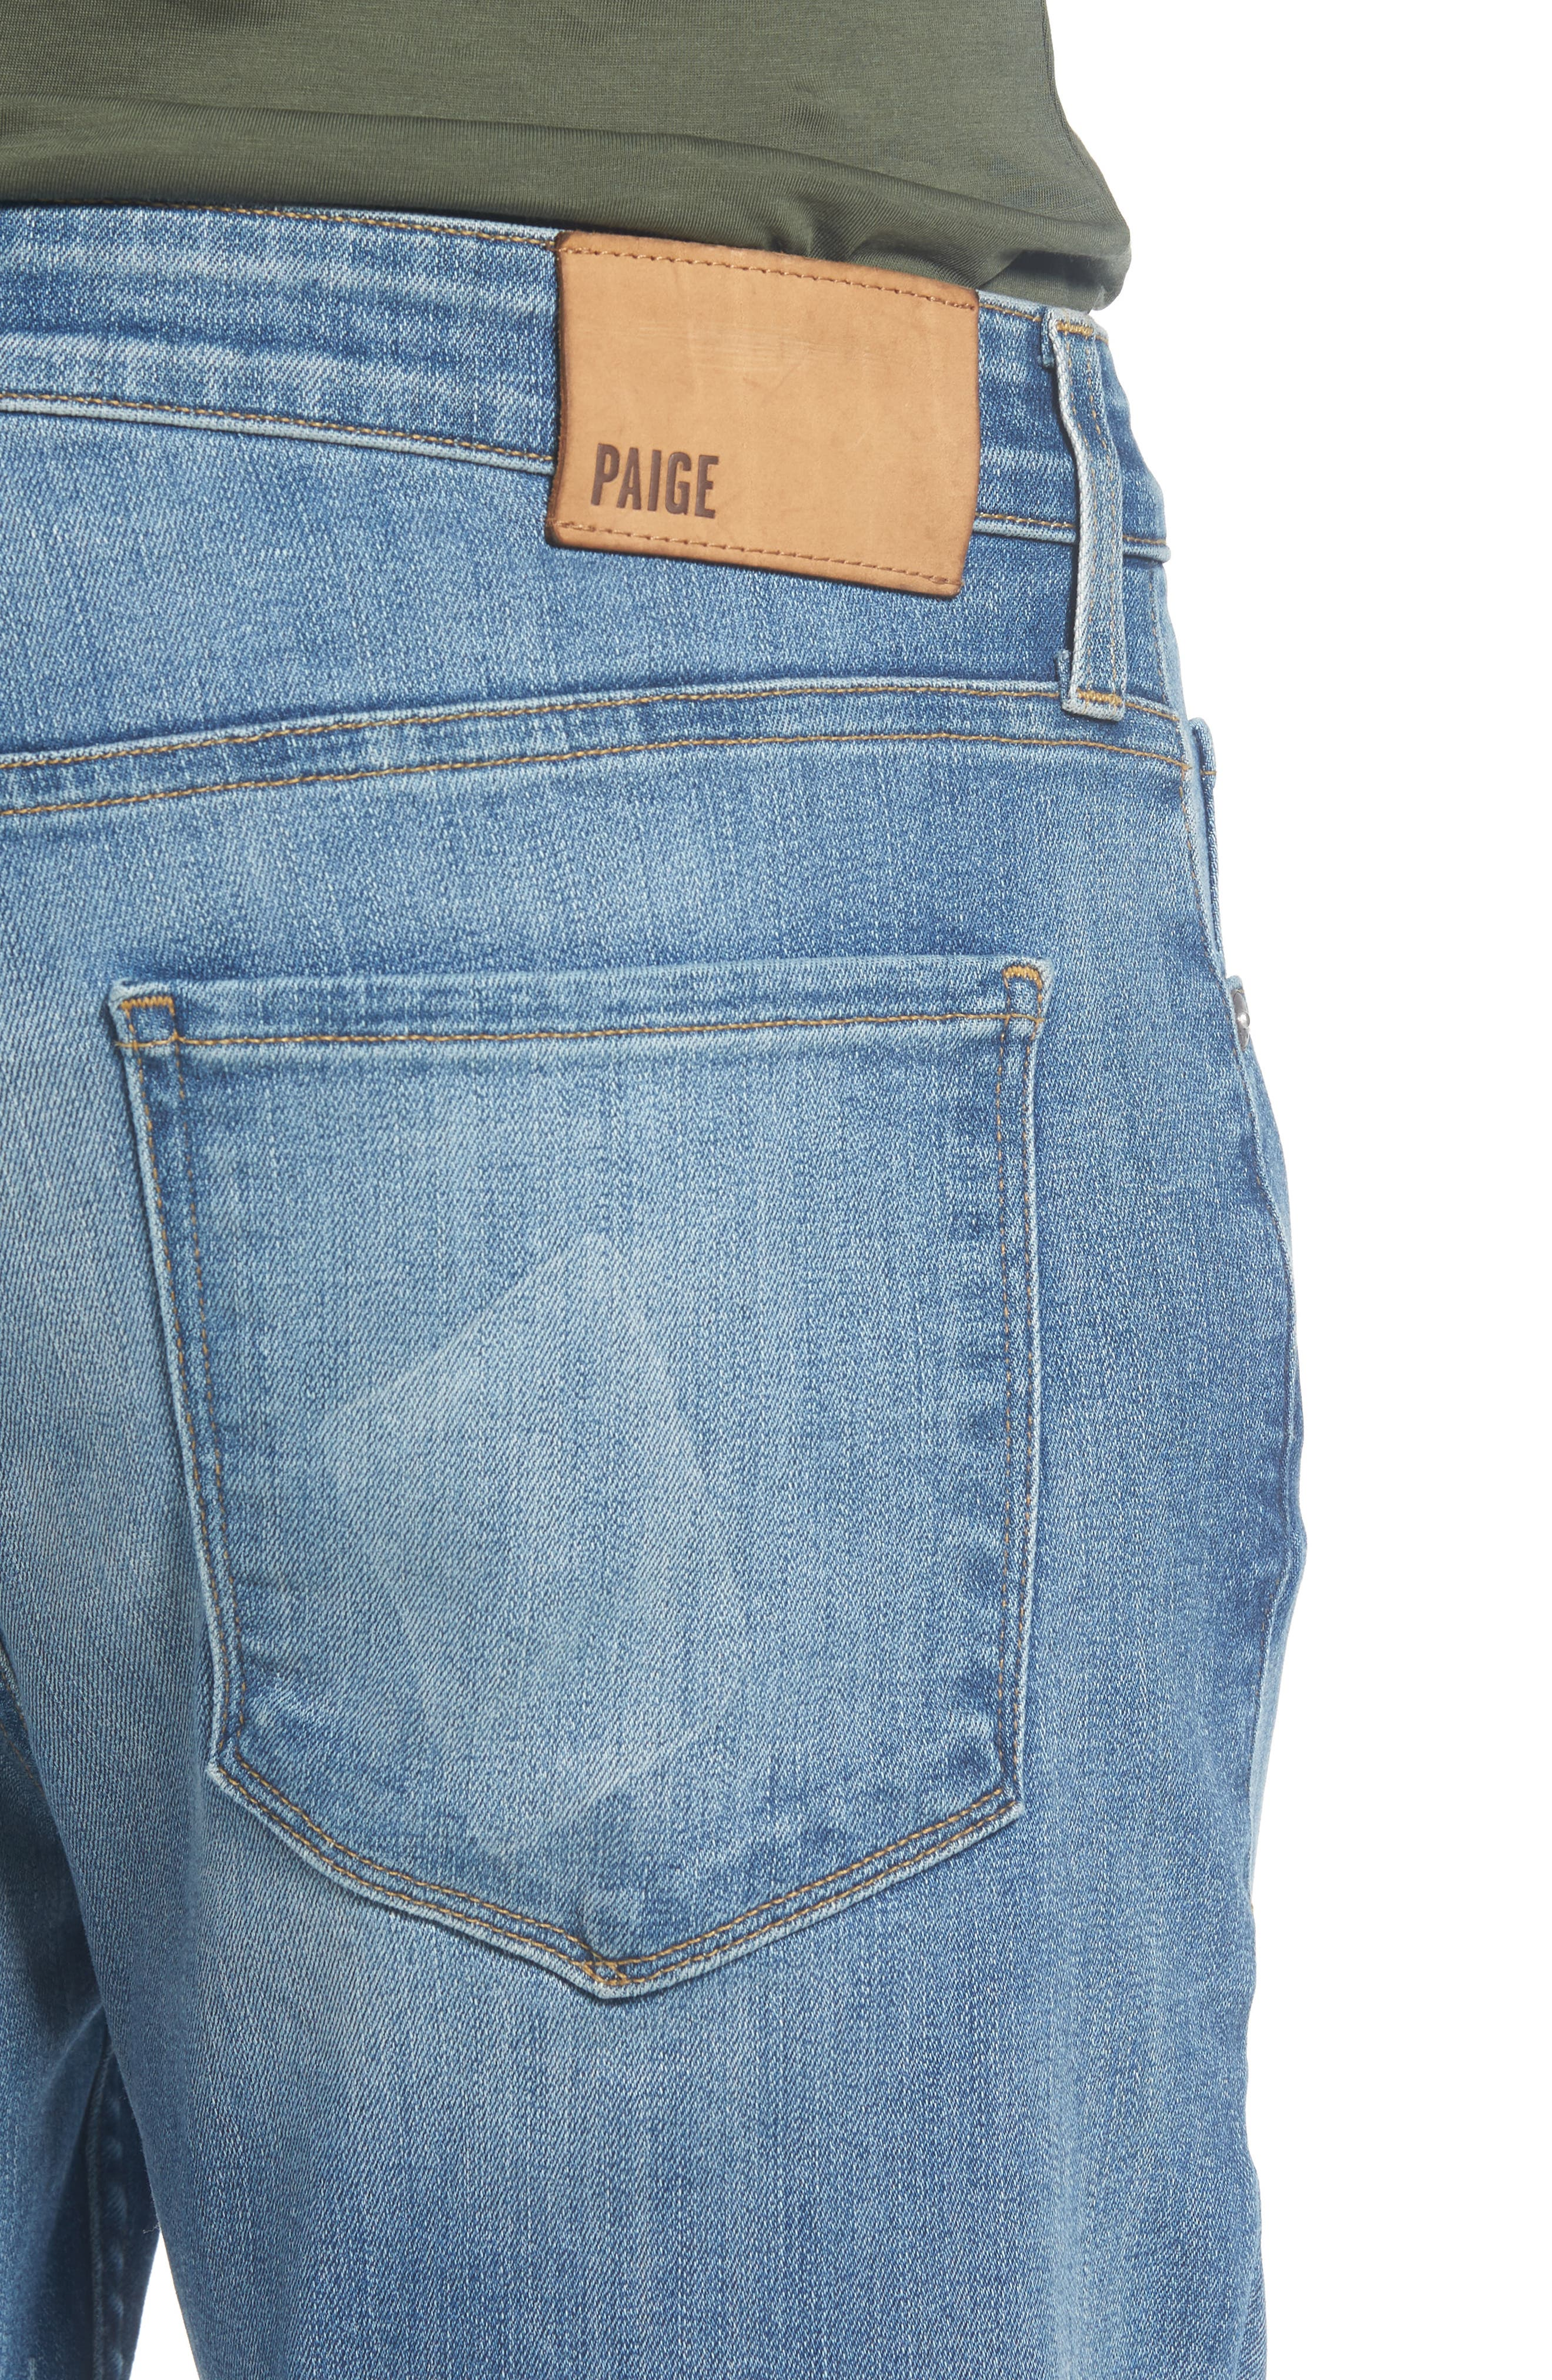 Transcend - Lennox Slim Fit Jeans,                             Alternate thumbnail 4, color,                             CARTWRIGHT